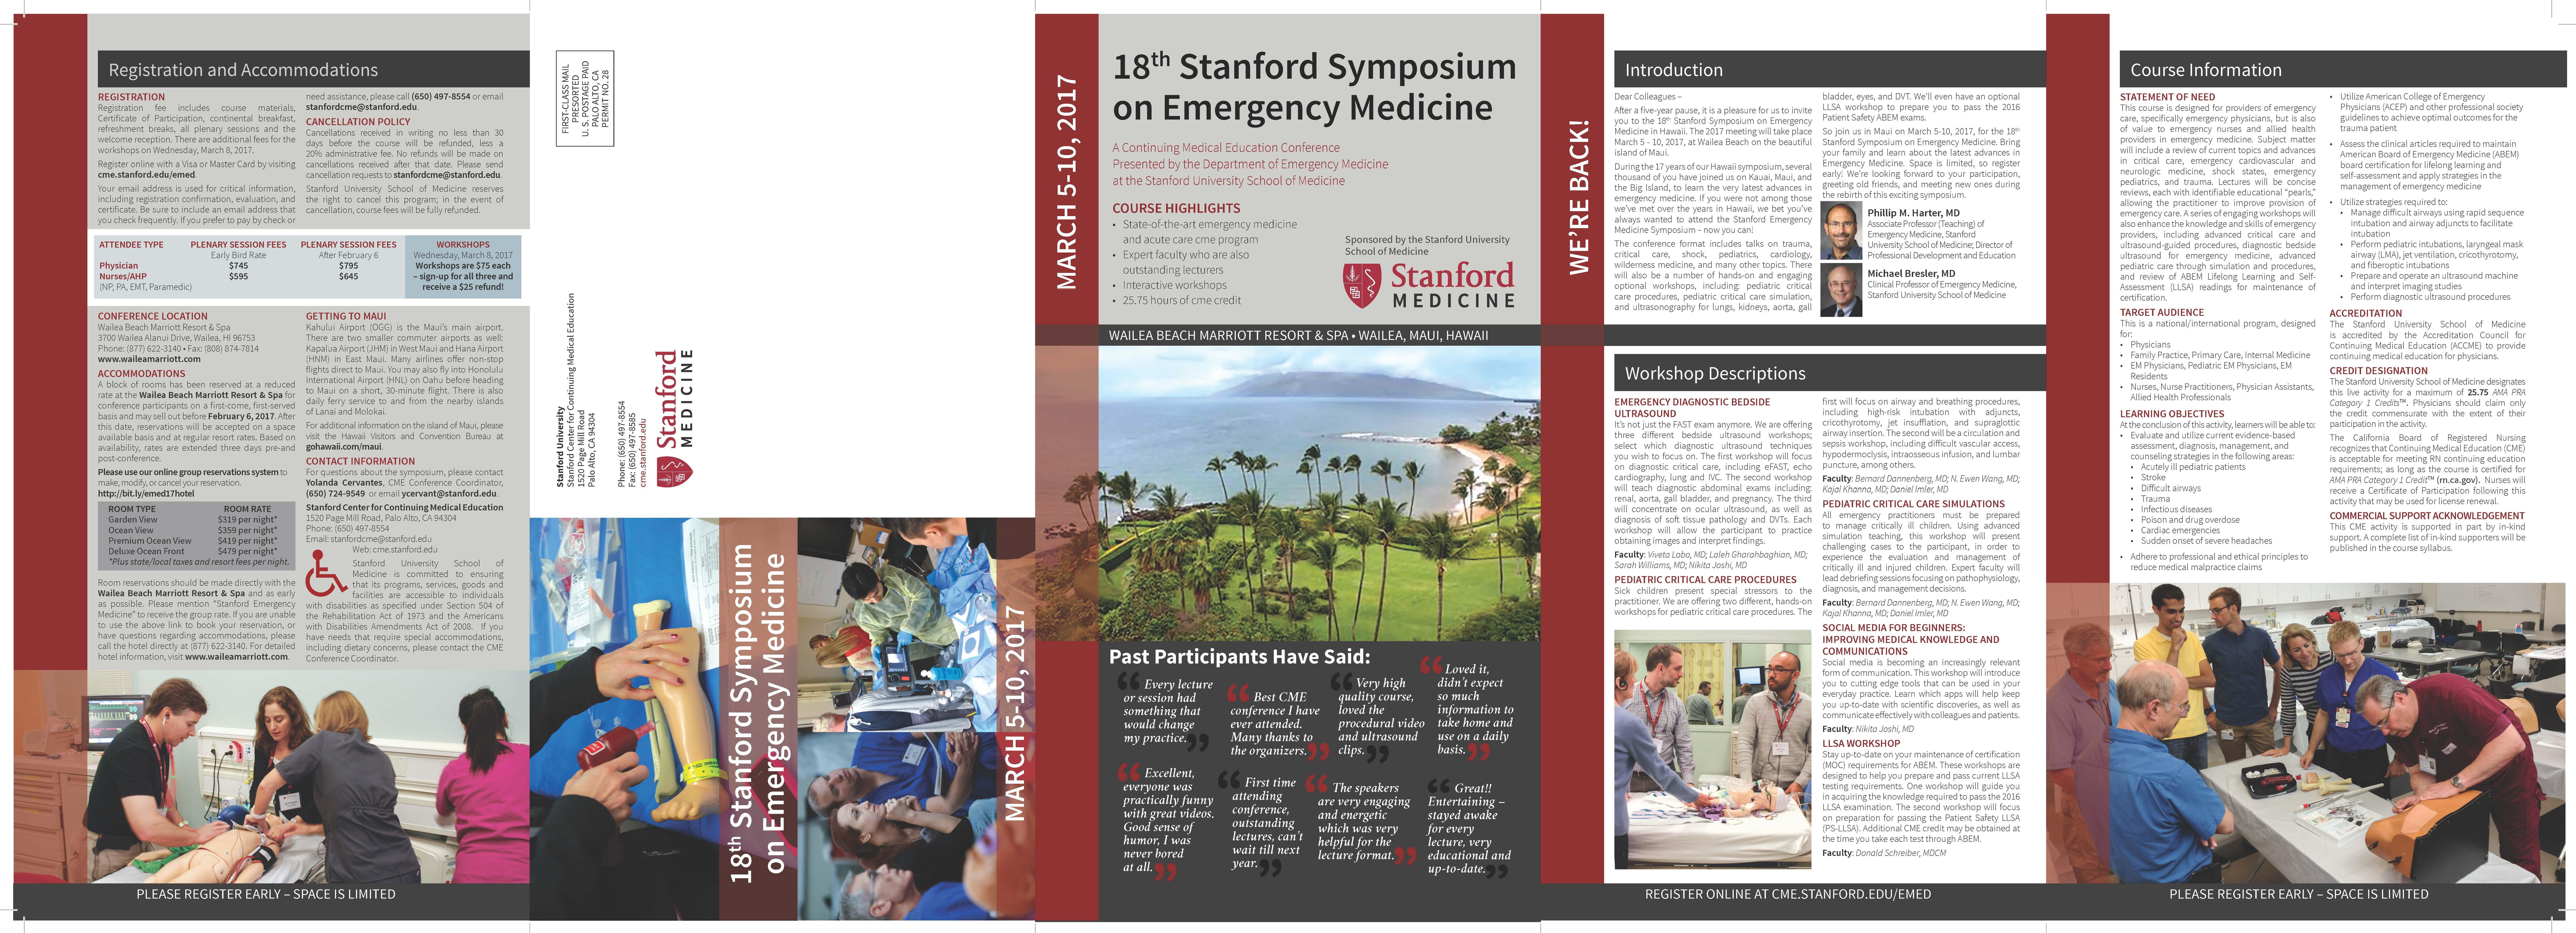 Stanford Emergency Medicine brochure